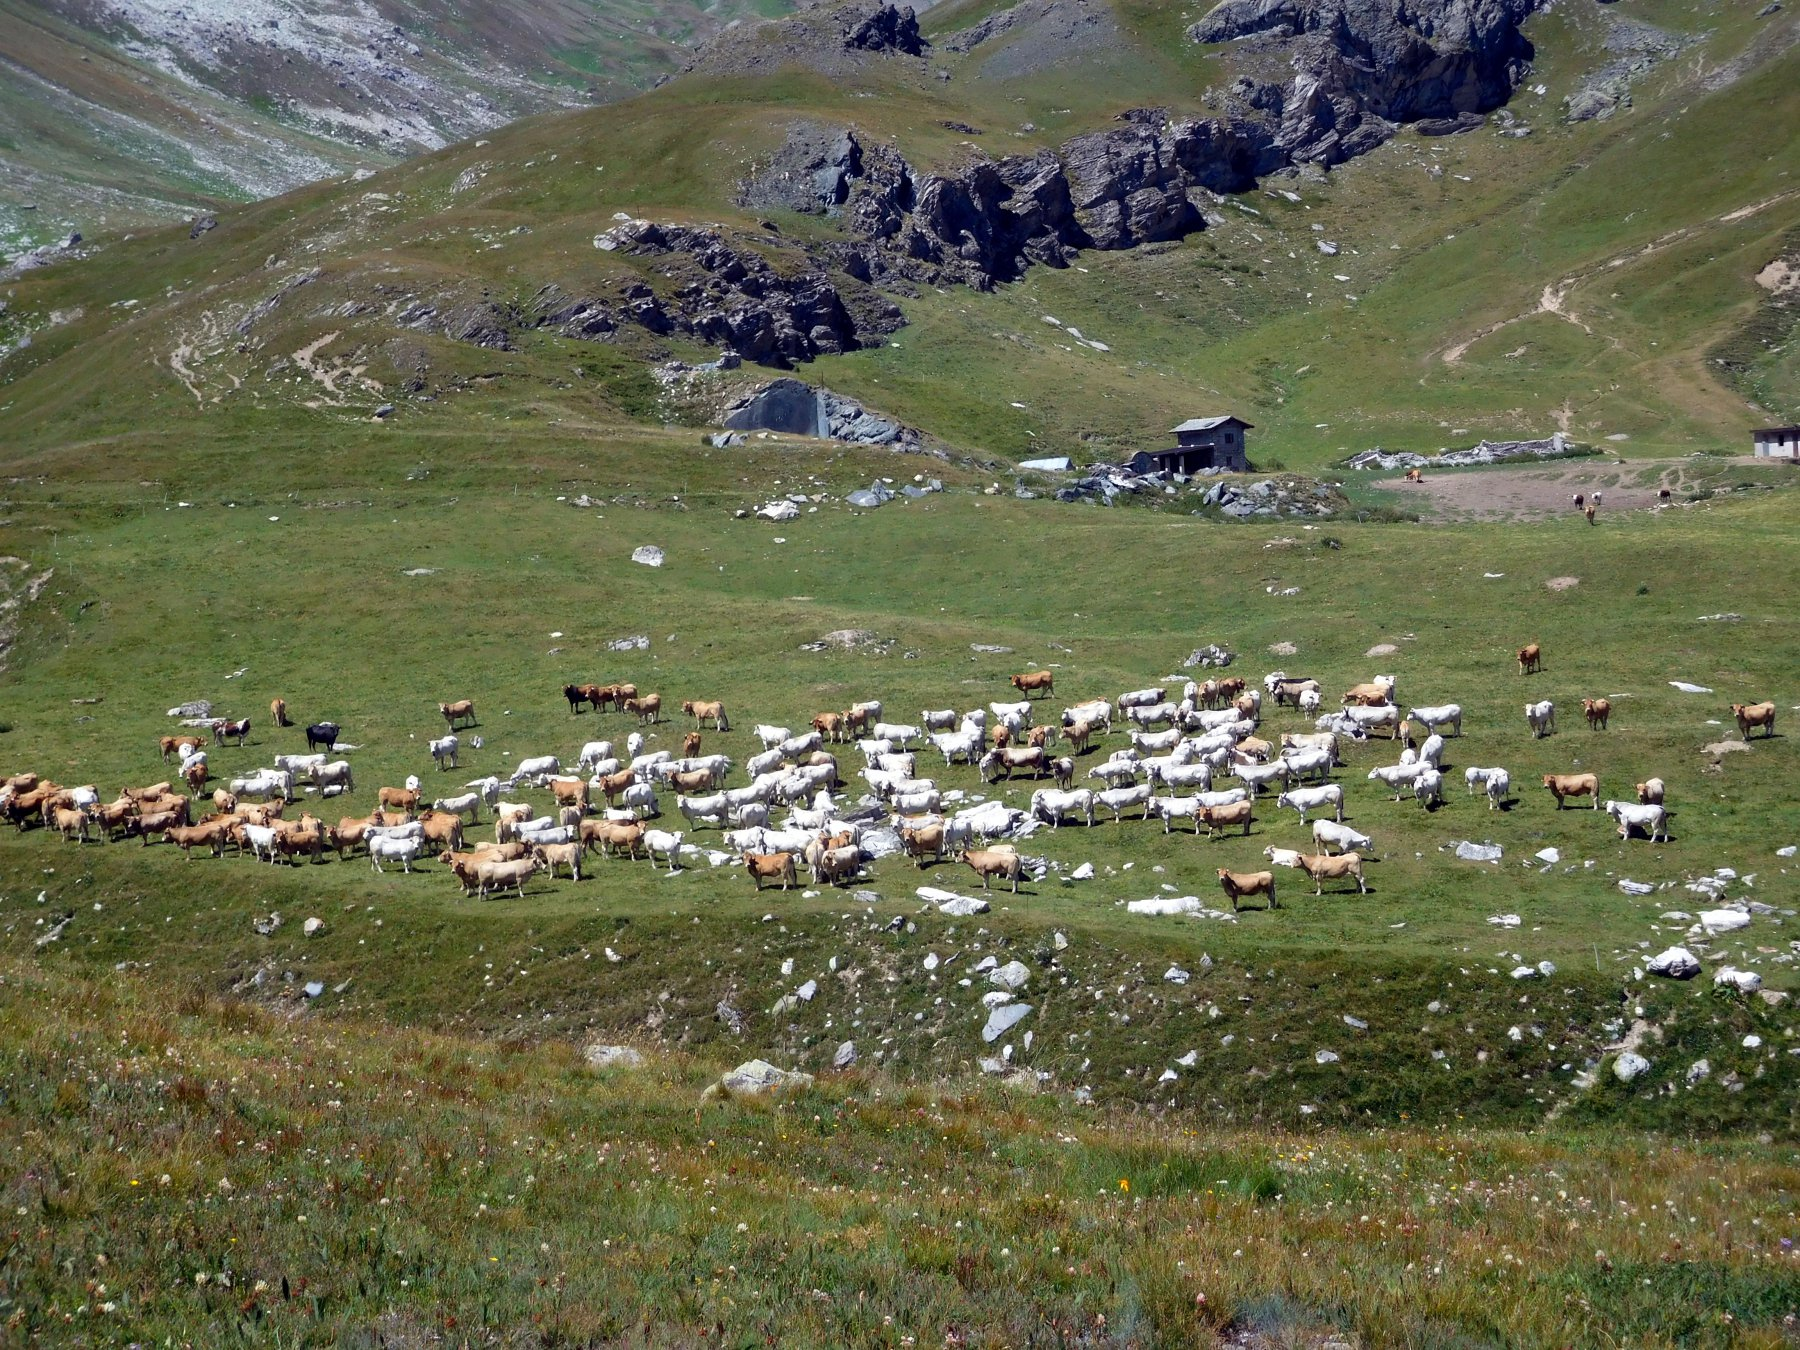 pascolando in valle Traversiera